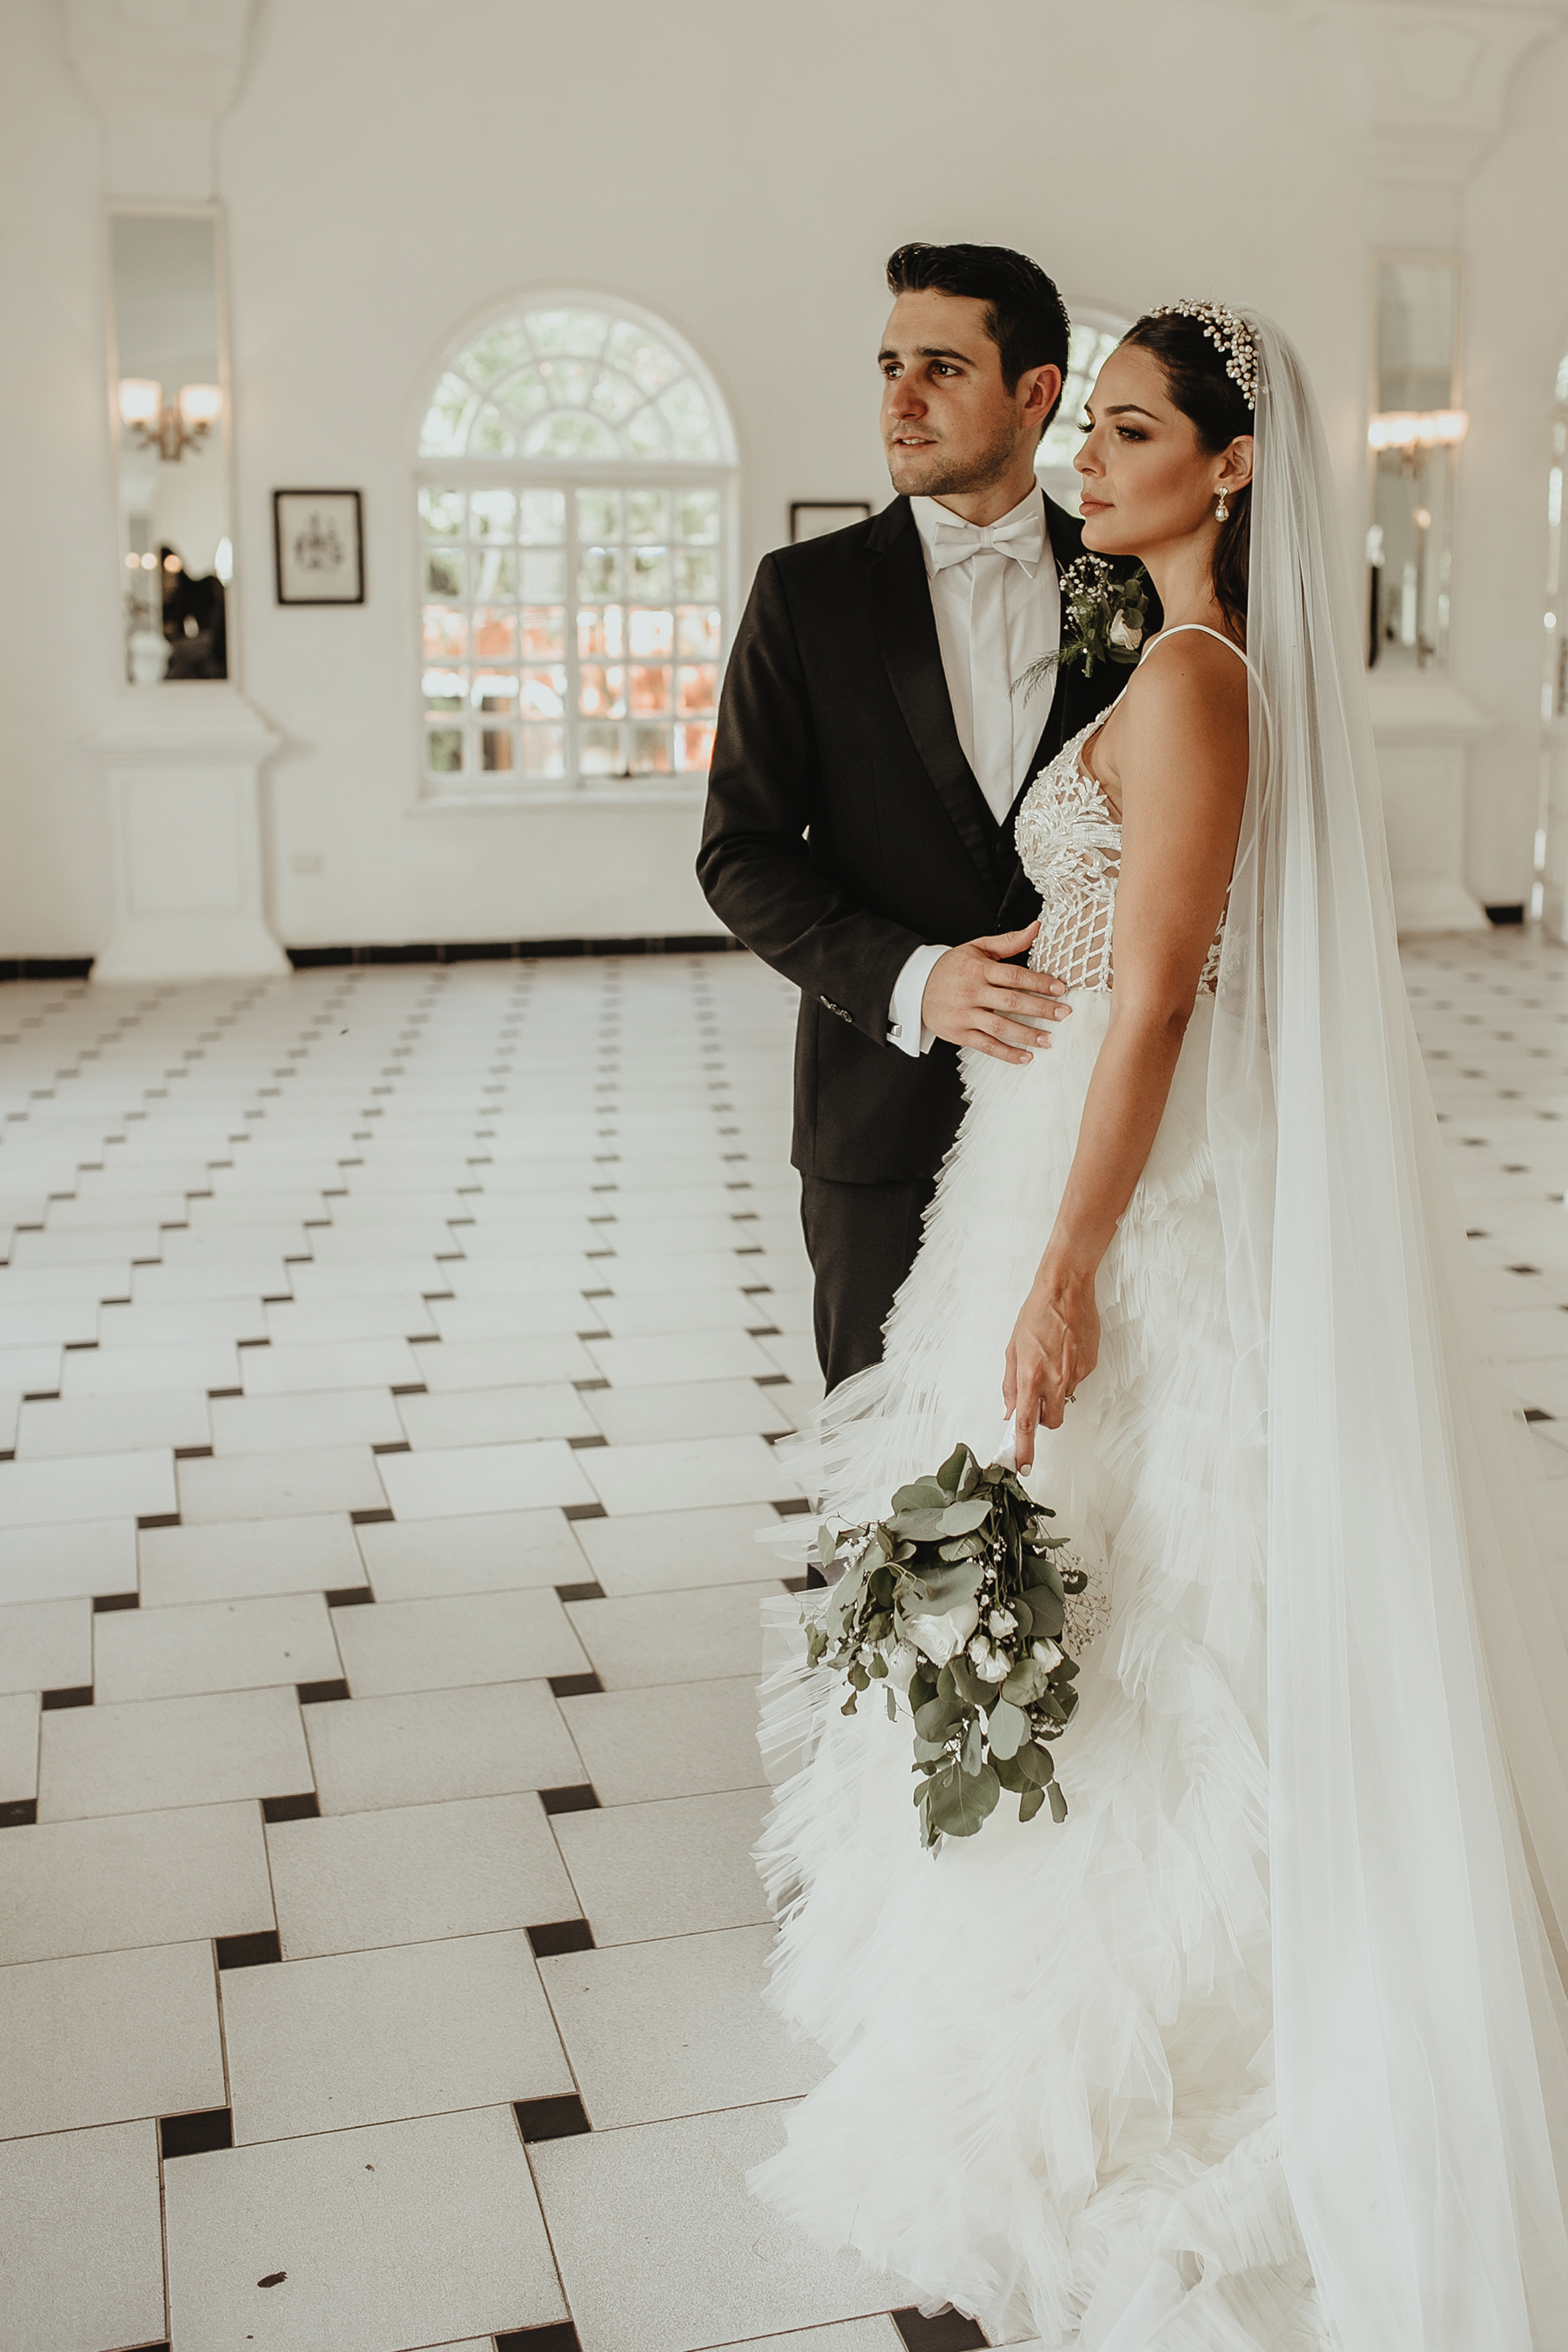 0372R&F__WeddingDestination_Weddingmerida_BodaMexico_FotografoDeBodas_FabrizioSimoneenFotografo.jpg